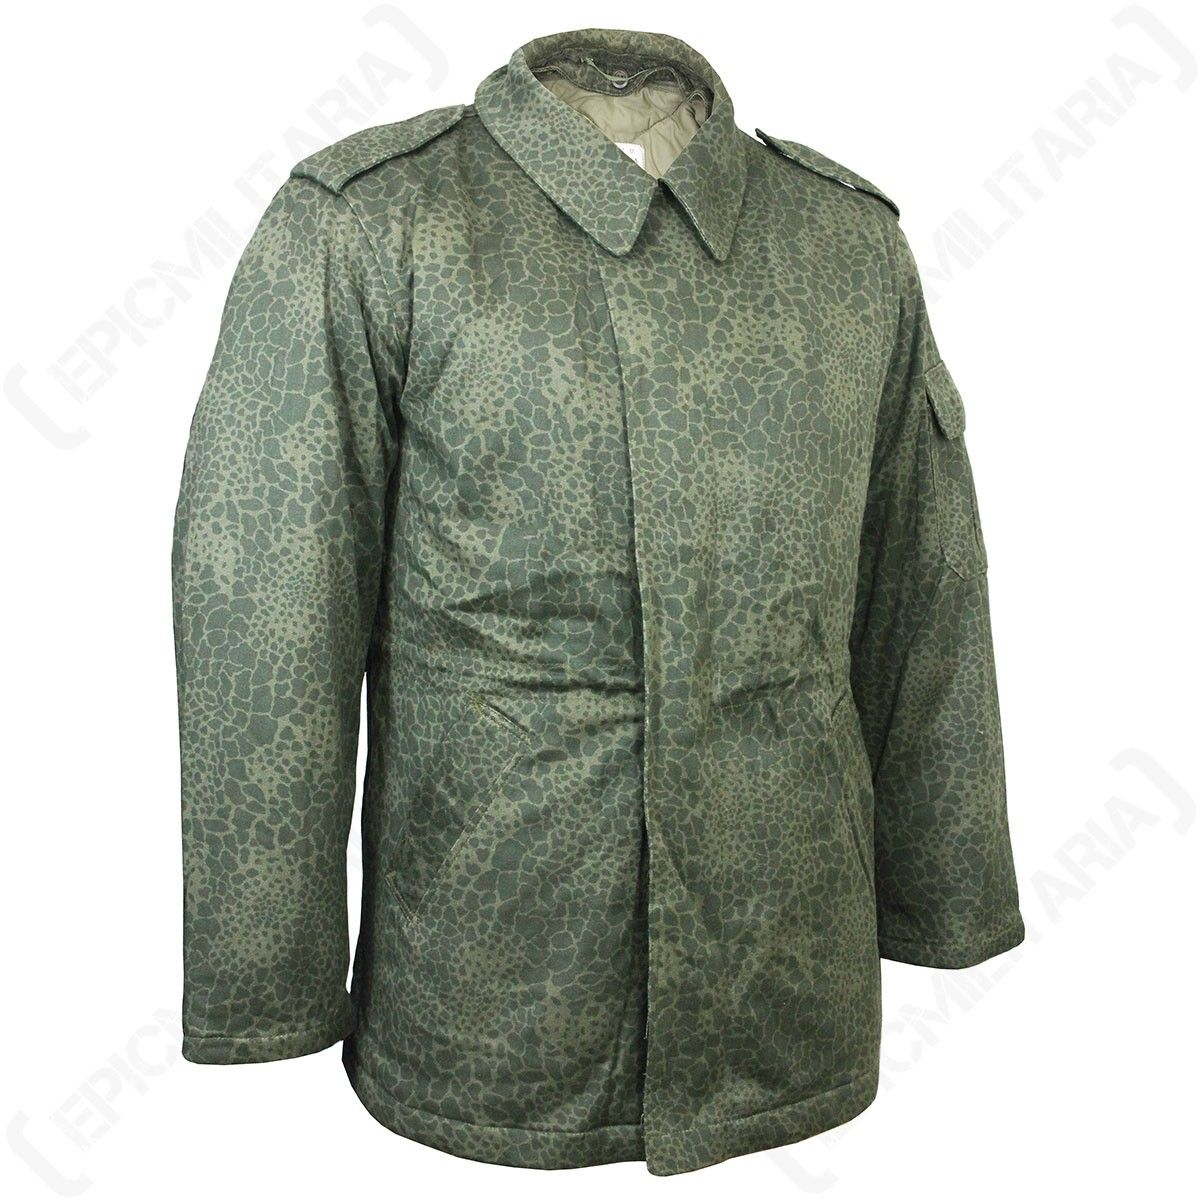 198f66e8cac Original British DPM Rip Stop Field Jacket